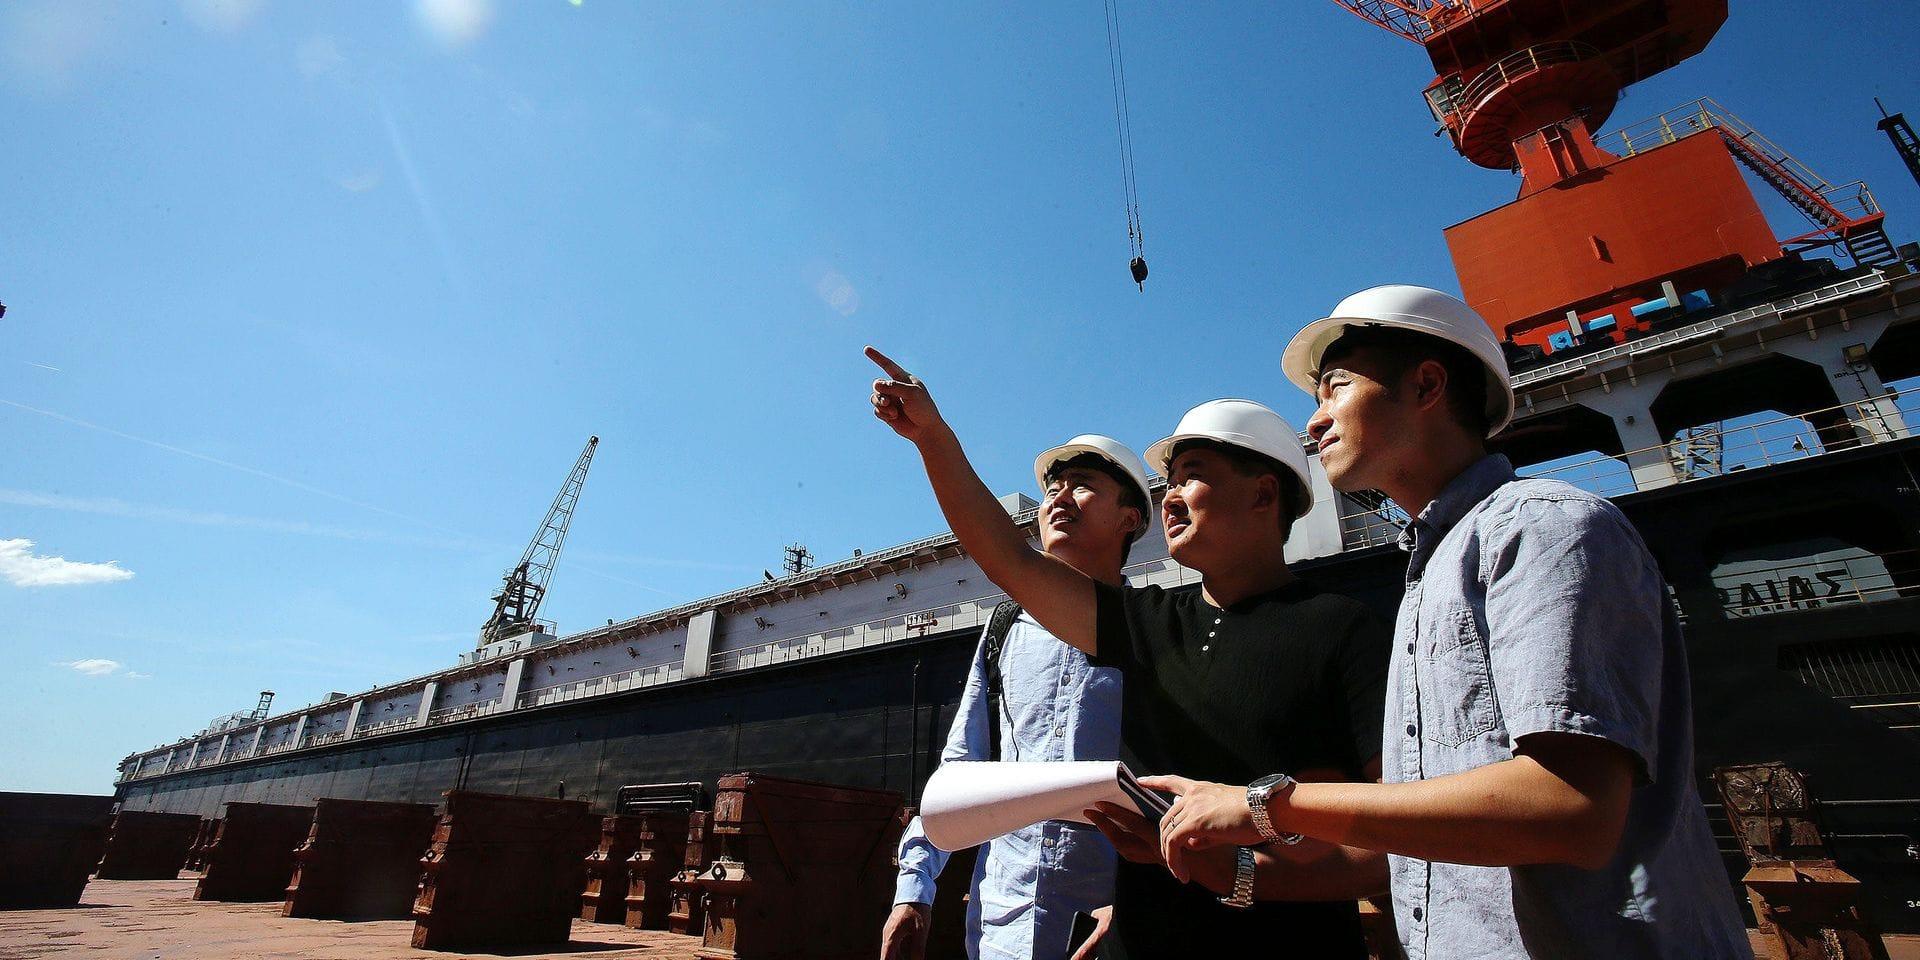 GREECE-PERAMA-CHINA COSCO SHIPPING-PIRAEUS PORT